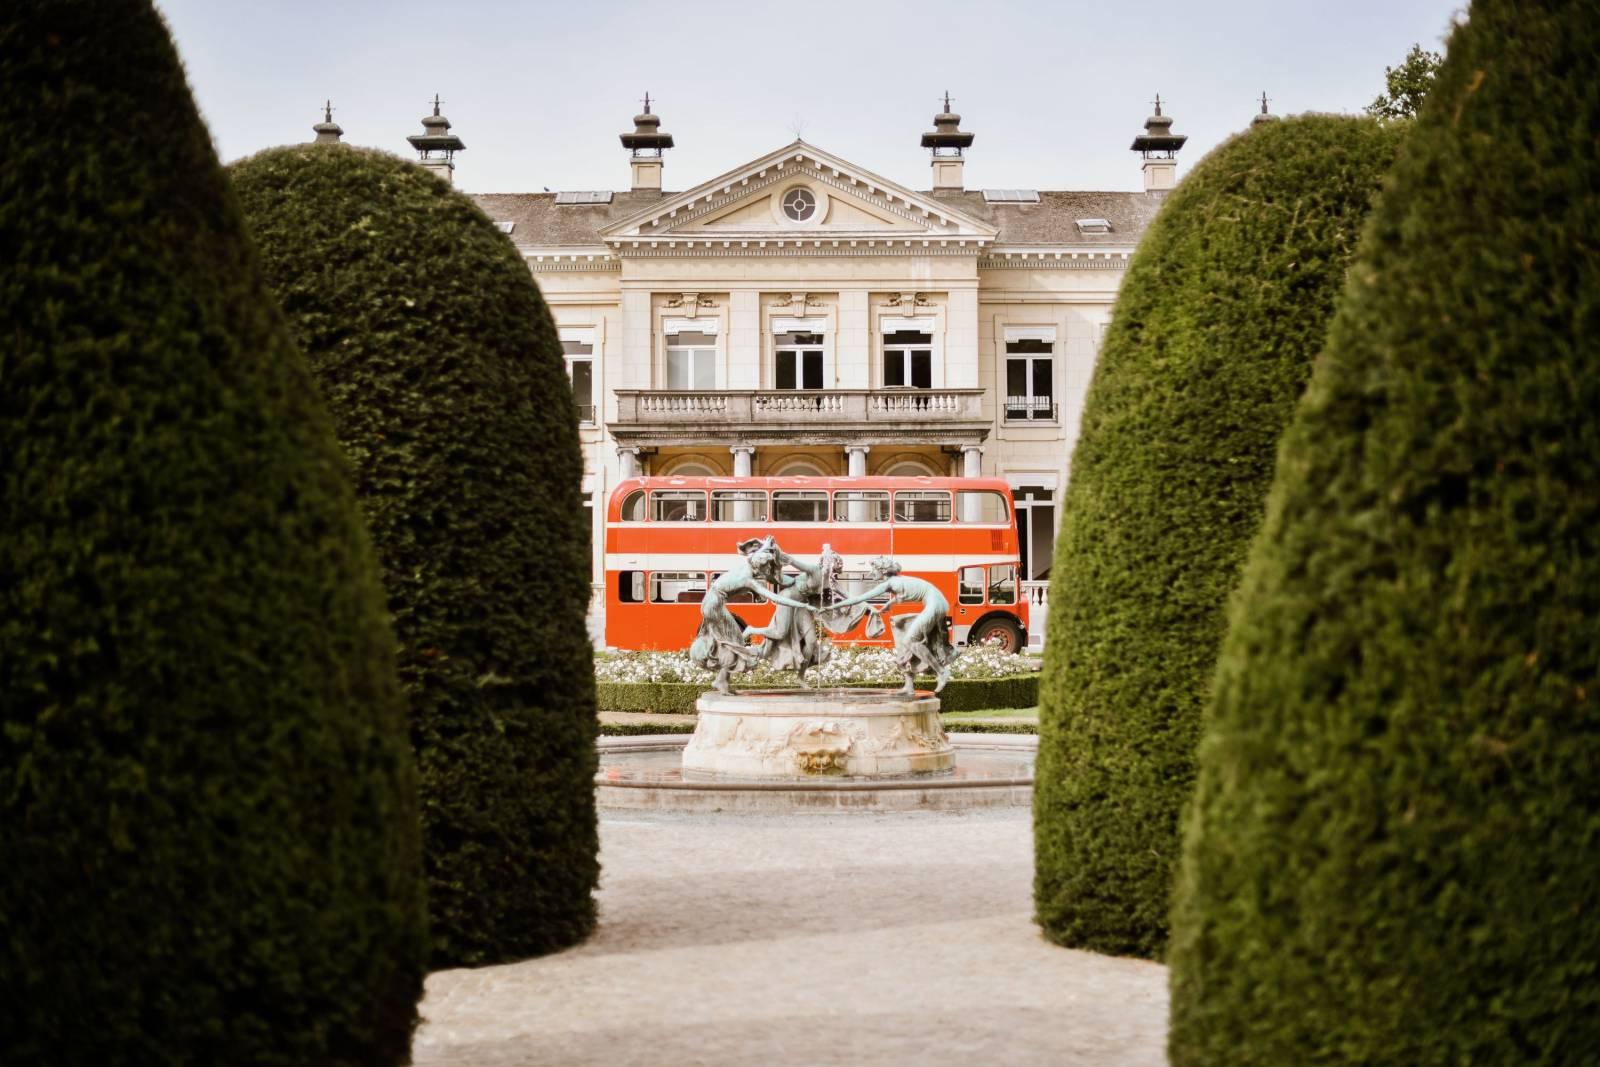 Kasteel Den Brandt - Feestzaal - Trouwzaal - Kasteel - House of Weddings - 37